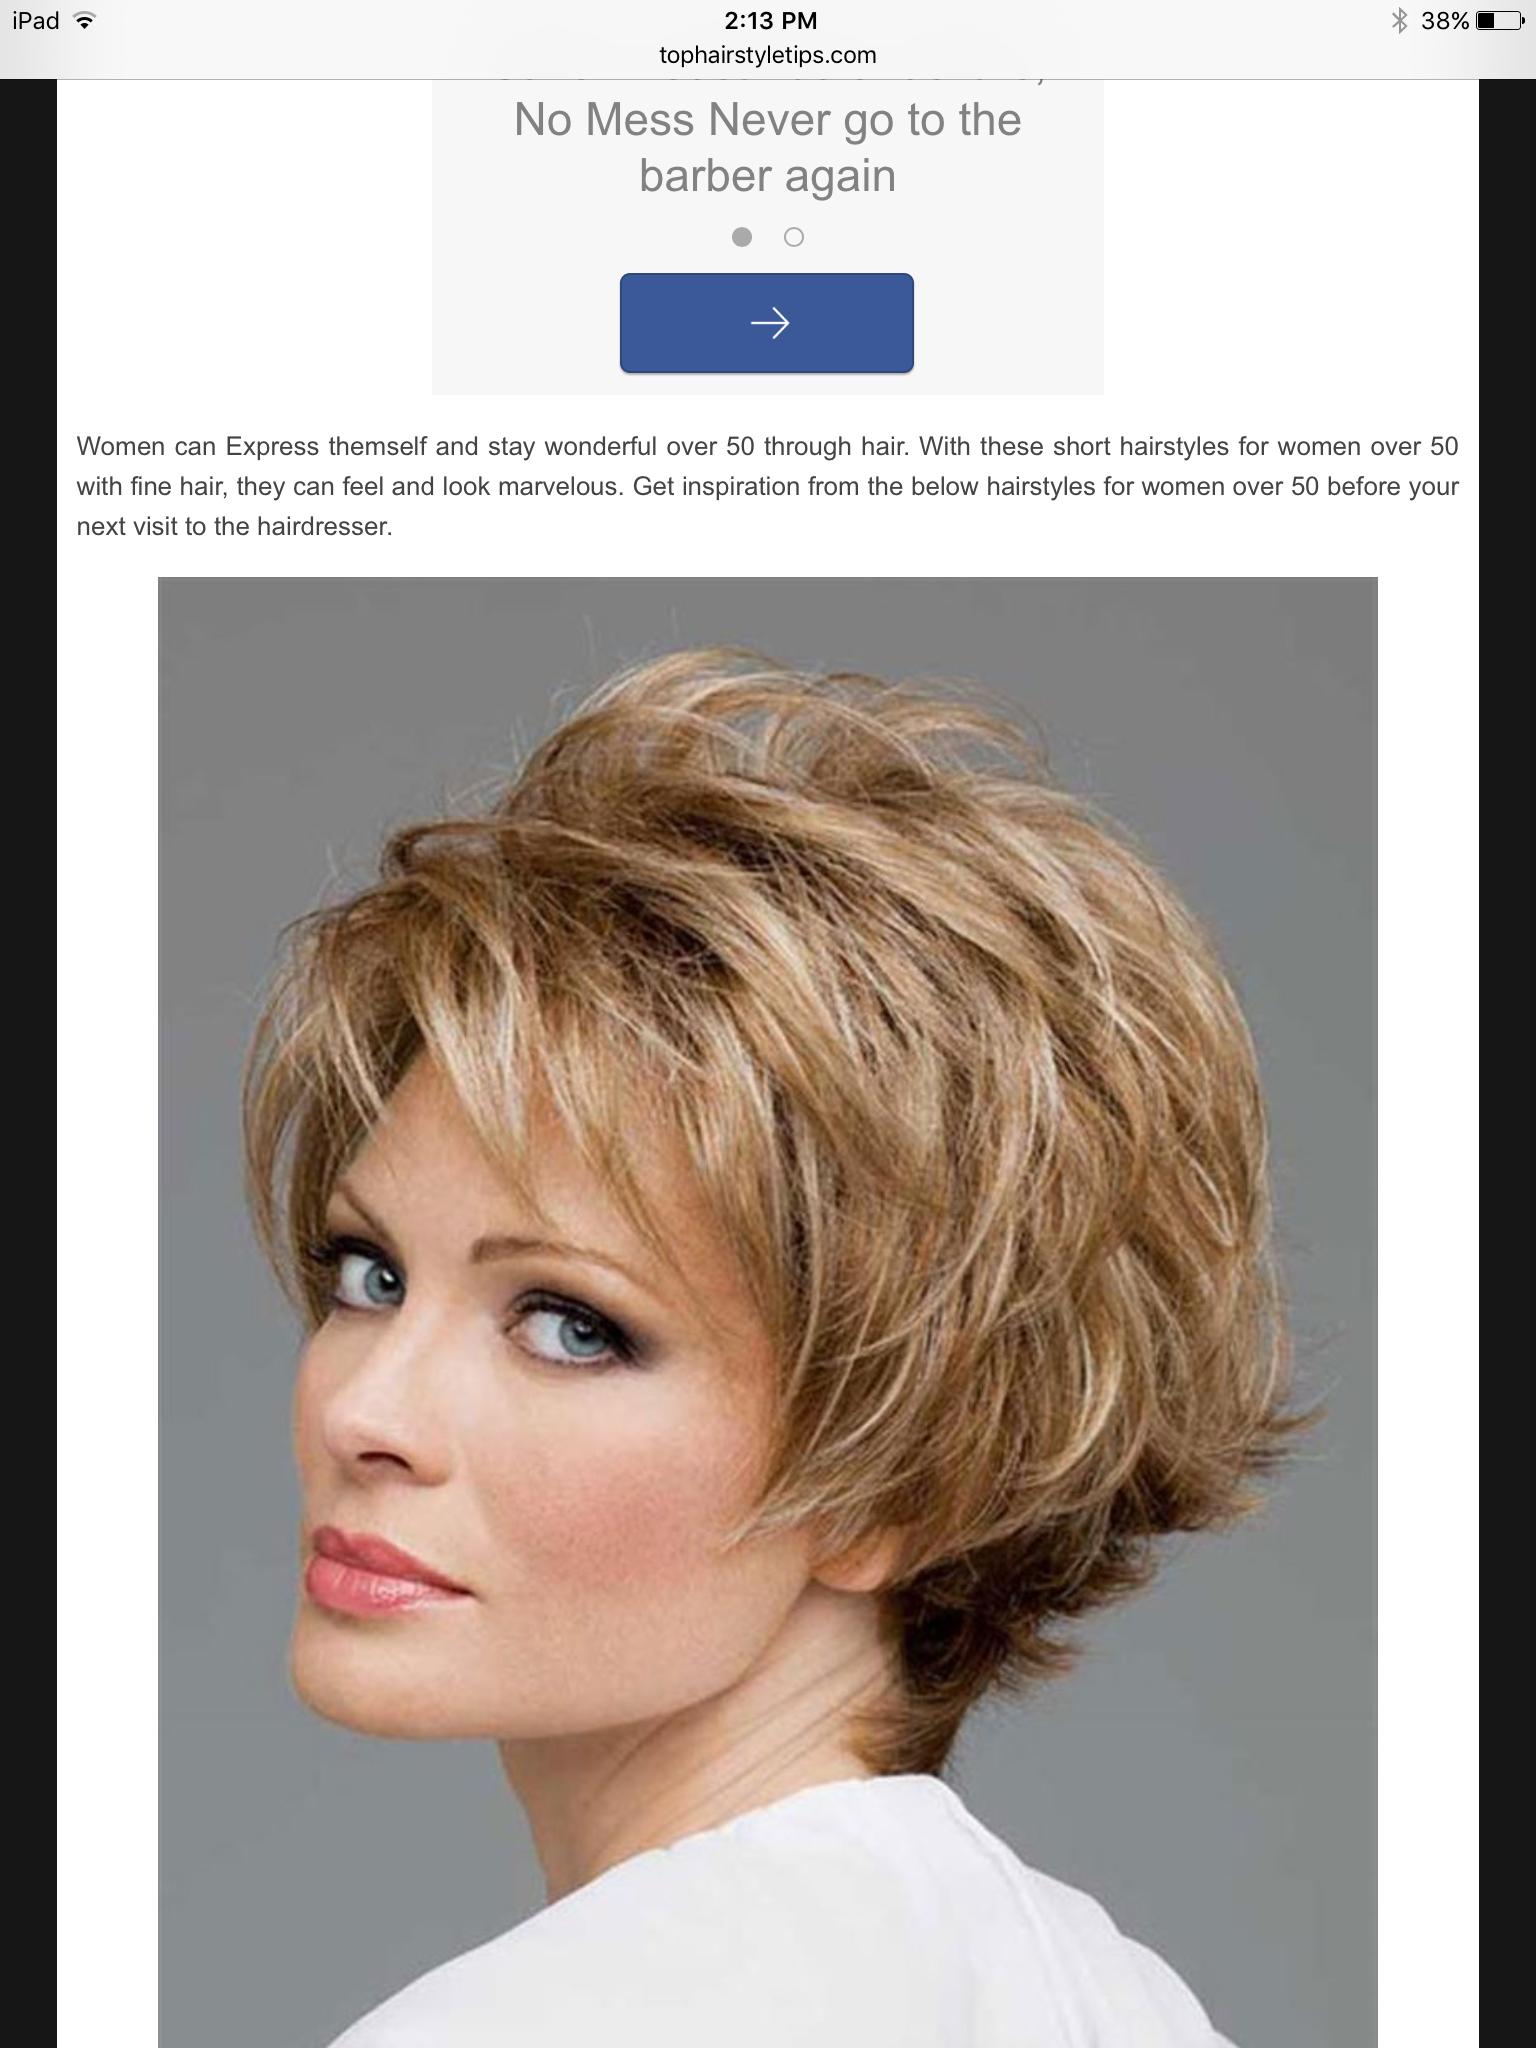 pin by susan de leon on hair styles | pinterest | hair style